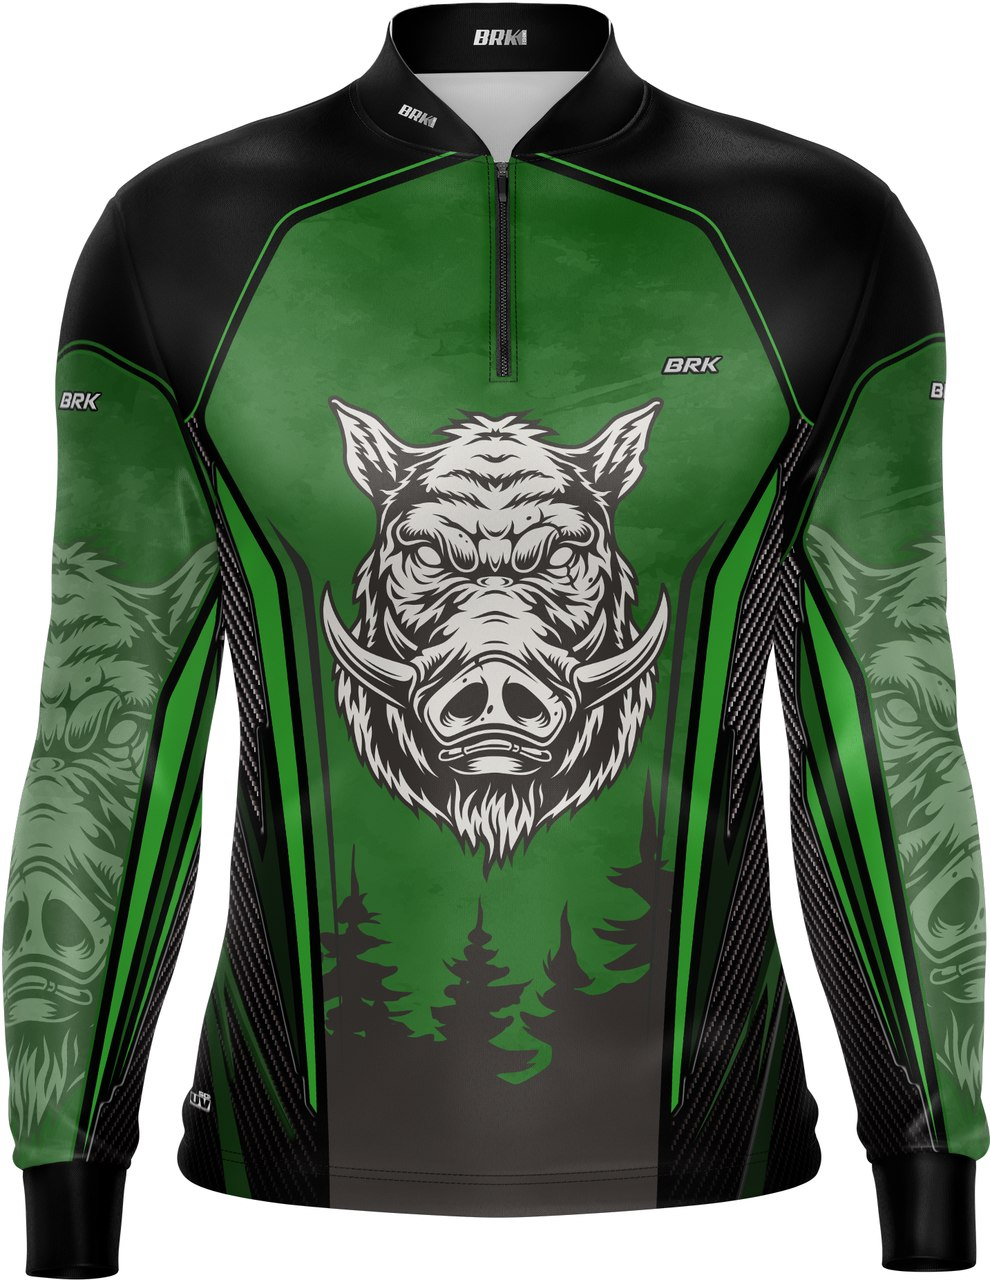 Camisa de Caça Brk Javali Verde com FPU 50+